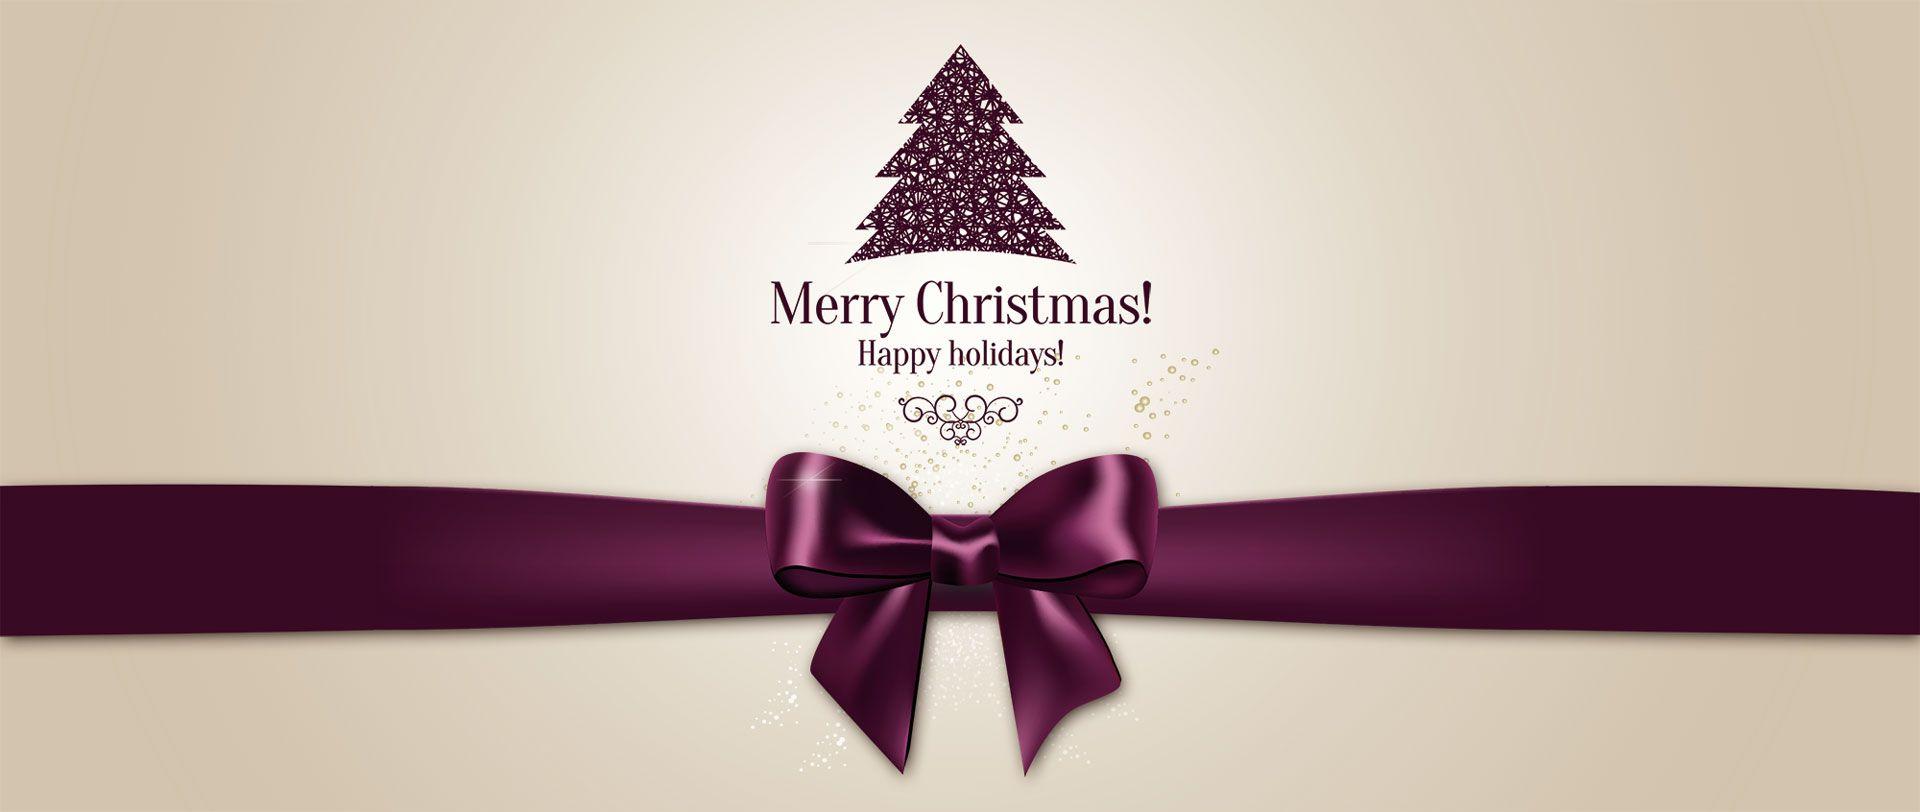 Noël Salut Carte Contexte | Christmas greetings, Christmas gift